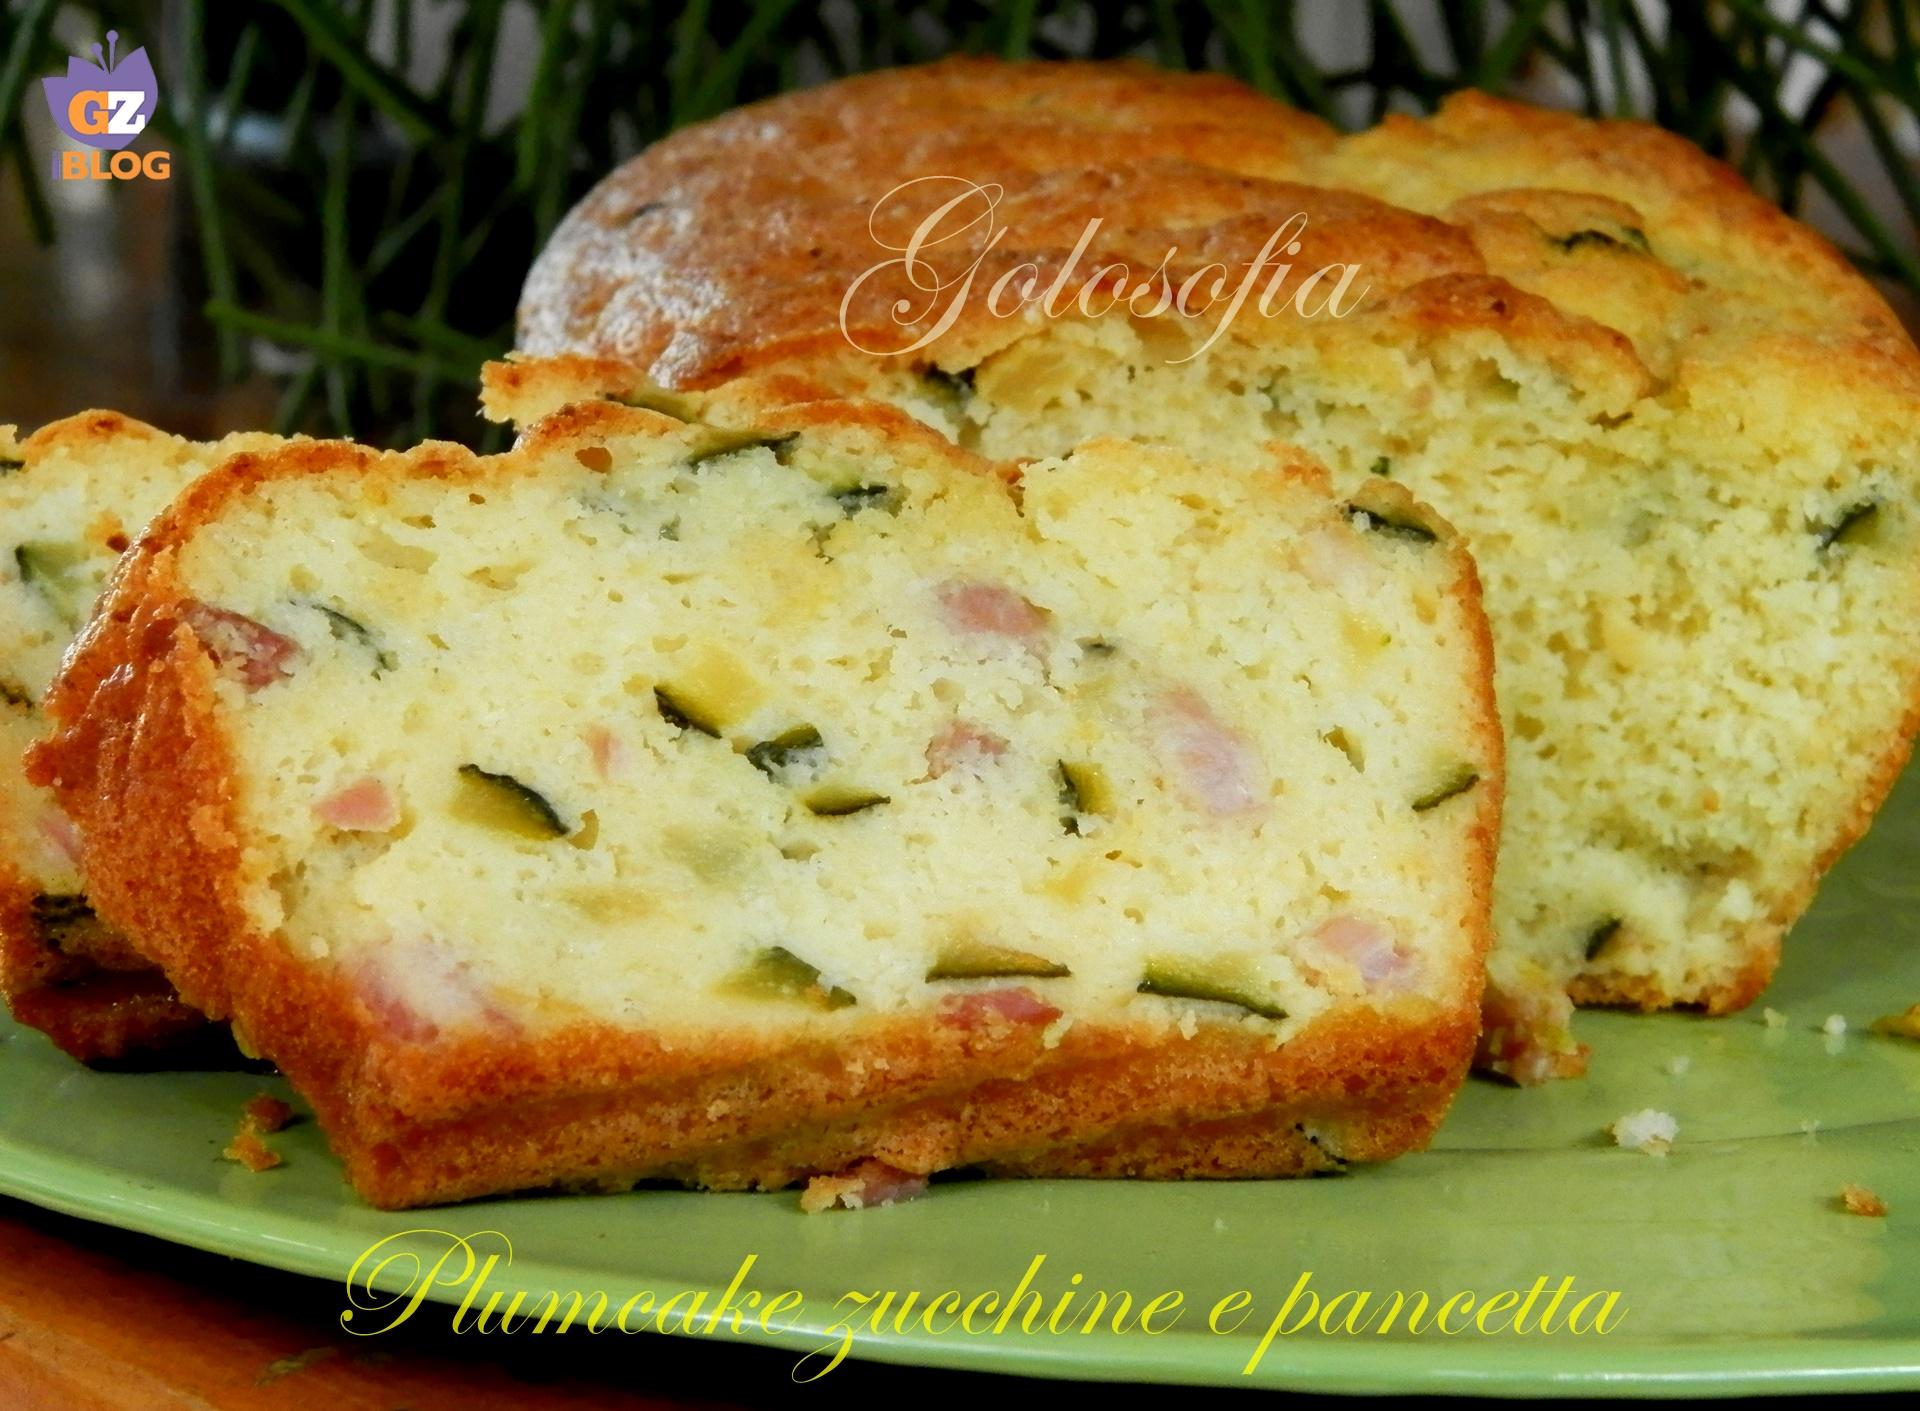 Plumcake zucchine e pancetta-ricetta antipasti-golosofia